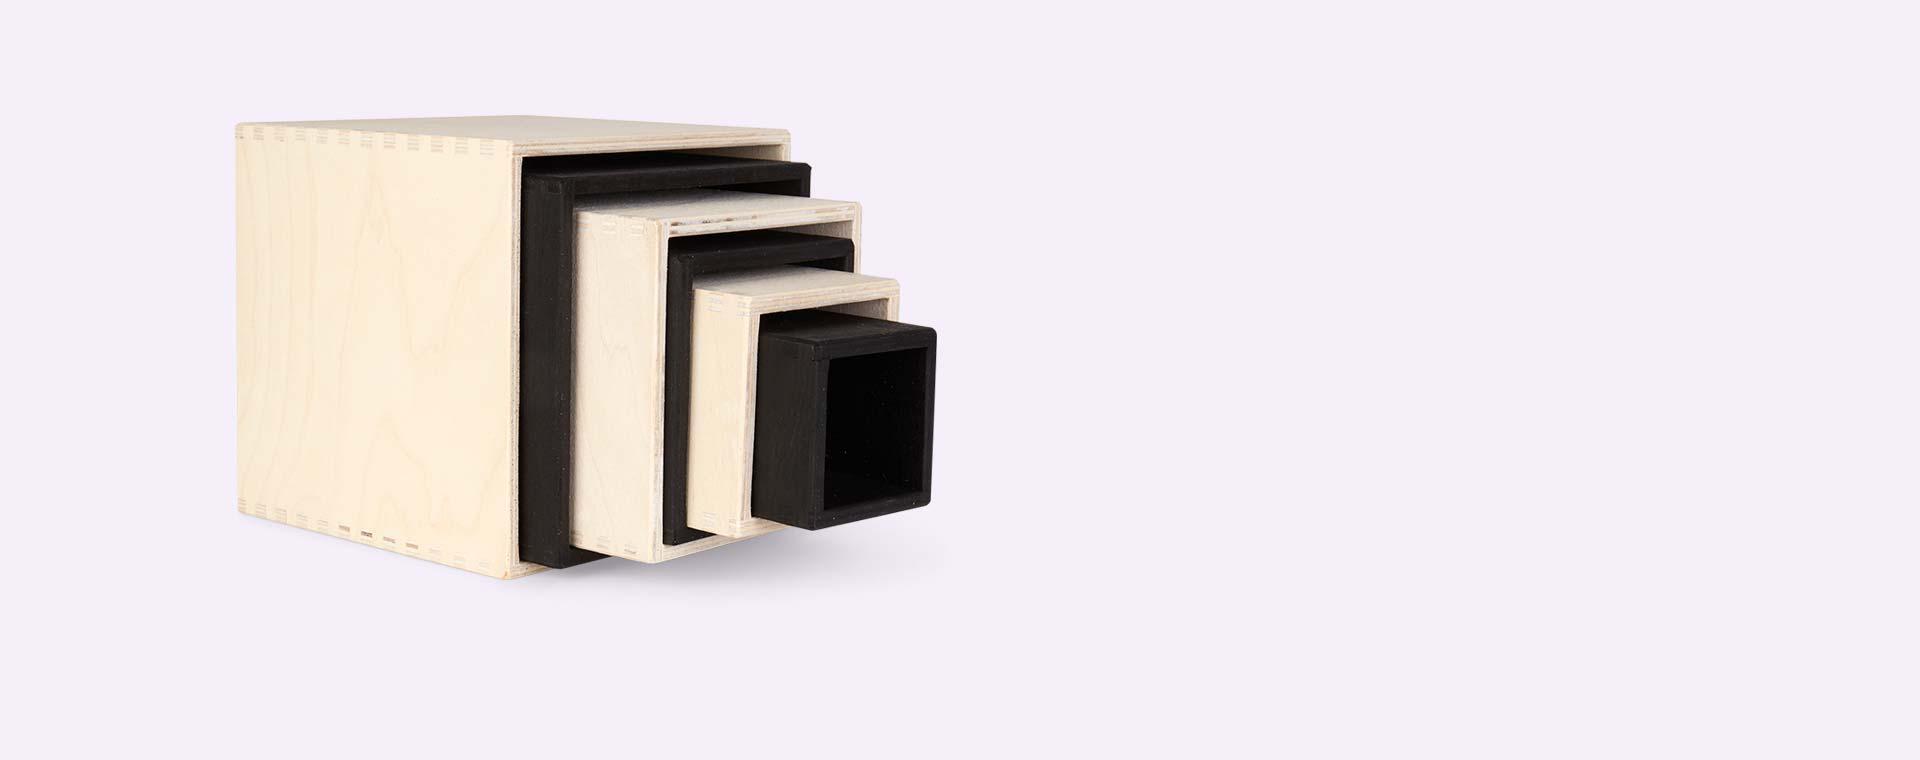 Monochrome Grimm's Large Set Of Boxes